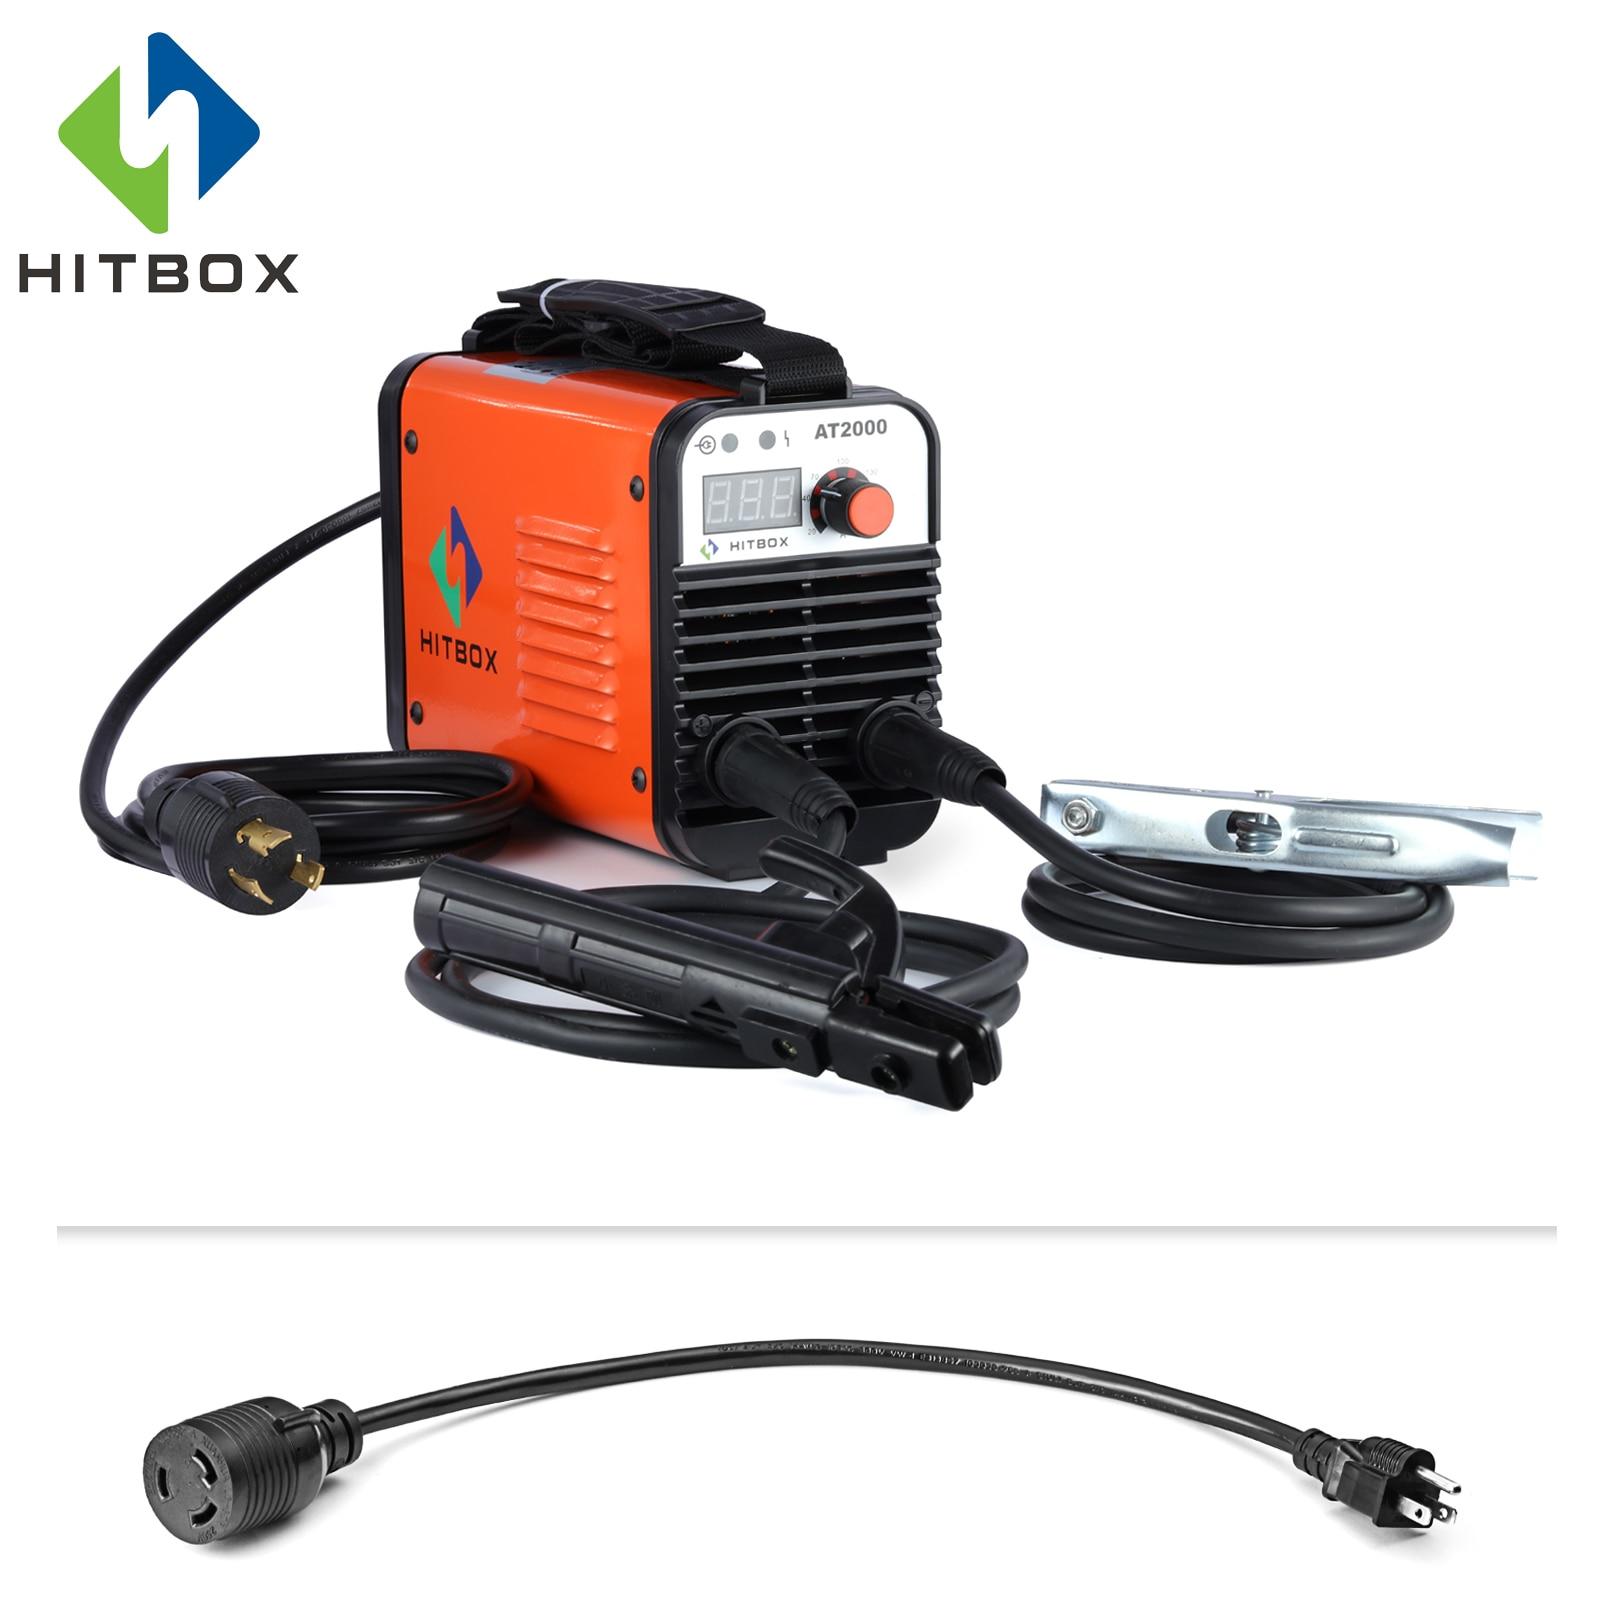 HITBOX 110V 220V Saldatrice Ad Arco AT2000 Inverter Arc Saldatore A Doppia Tensione IGBT Tecnologia Nuovo Arrivo MMA Saldatore